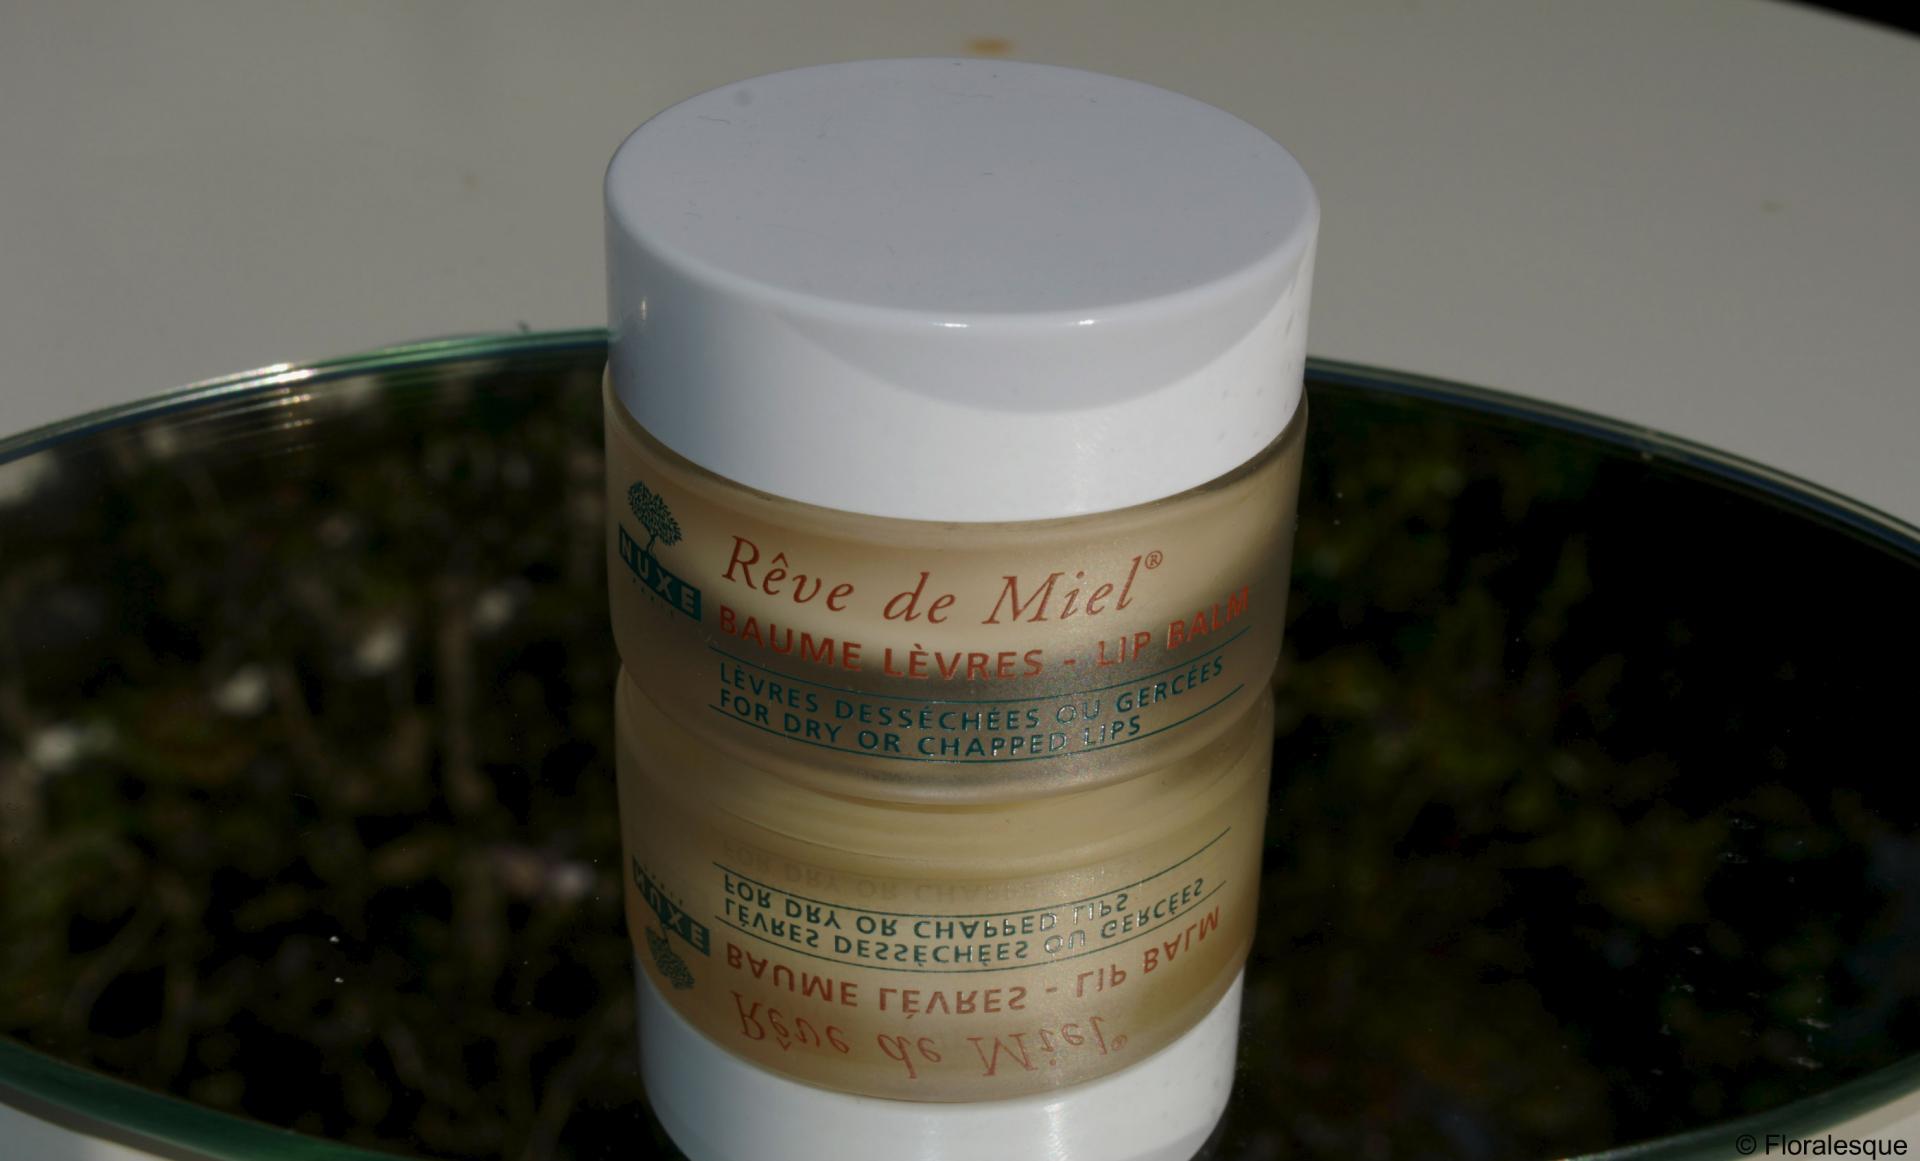 My go to lip balm - Nuxe Reve de Miel Ultra-Nourishing Lip Balm